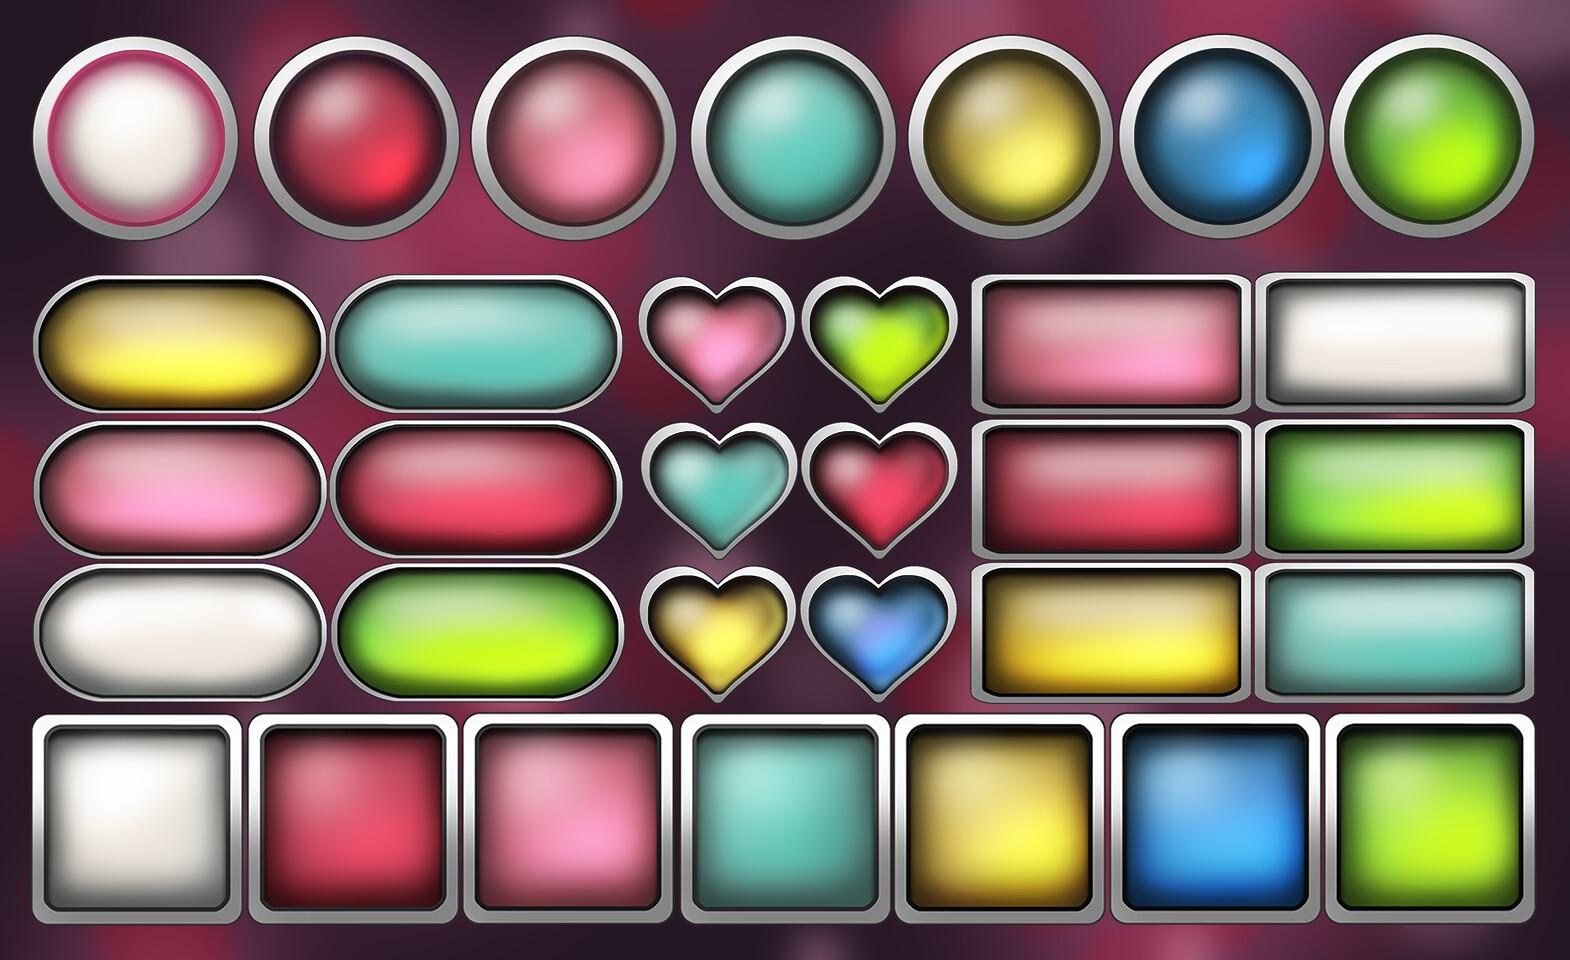 Button frames